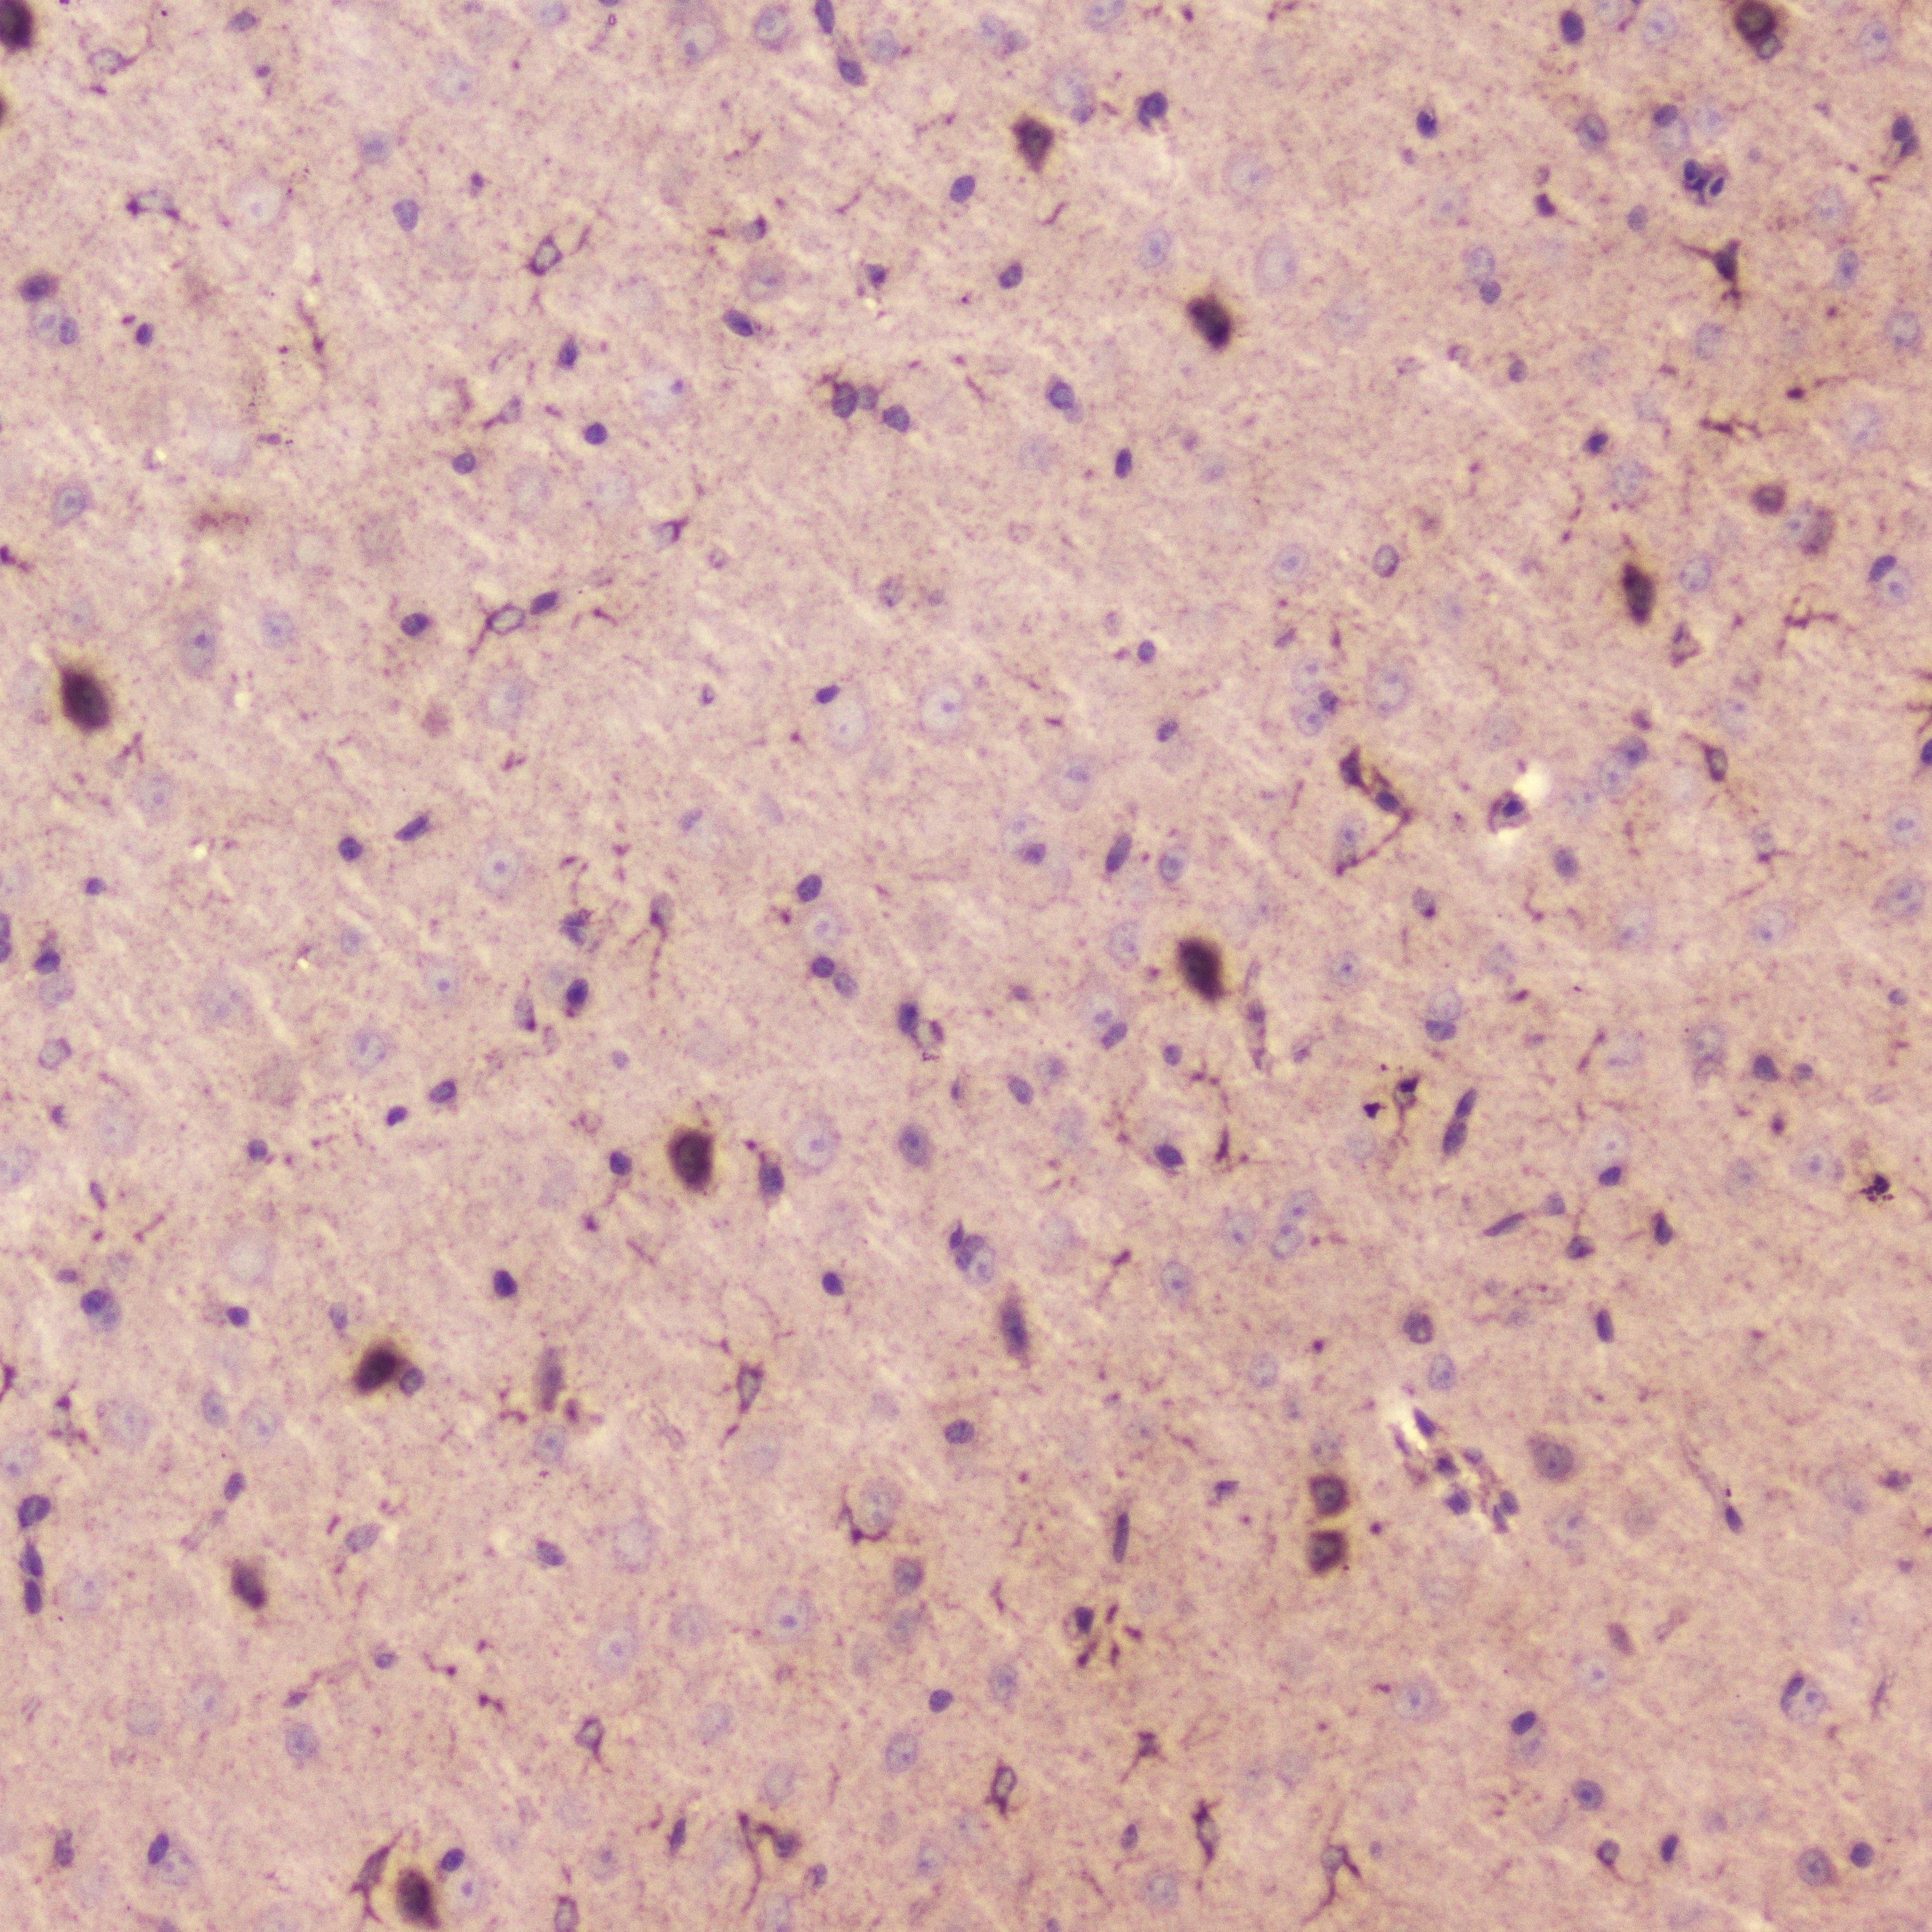 SPARCL1 Antibody in Immunohistochemistry (Paraffin) (IHC (P))